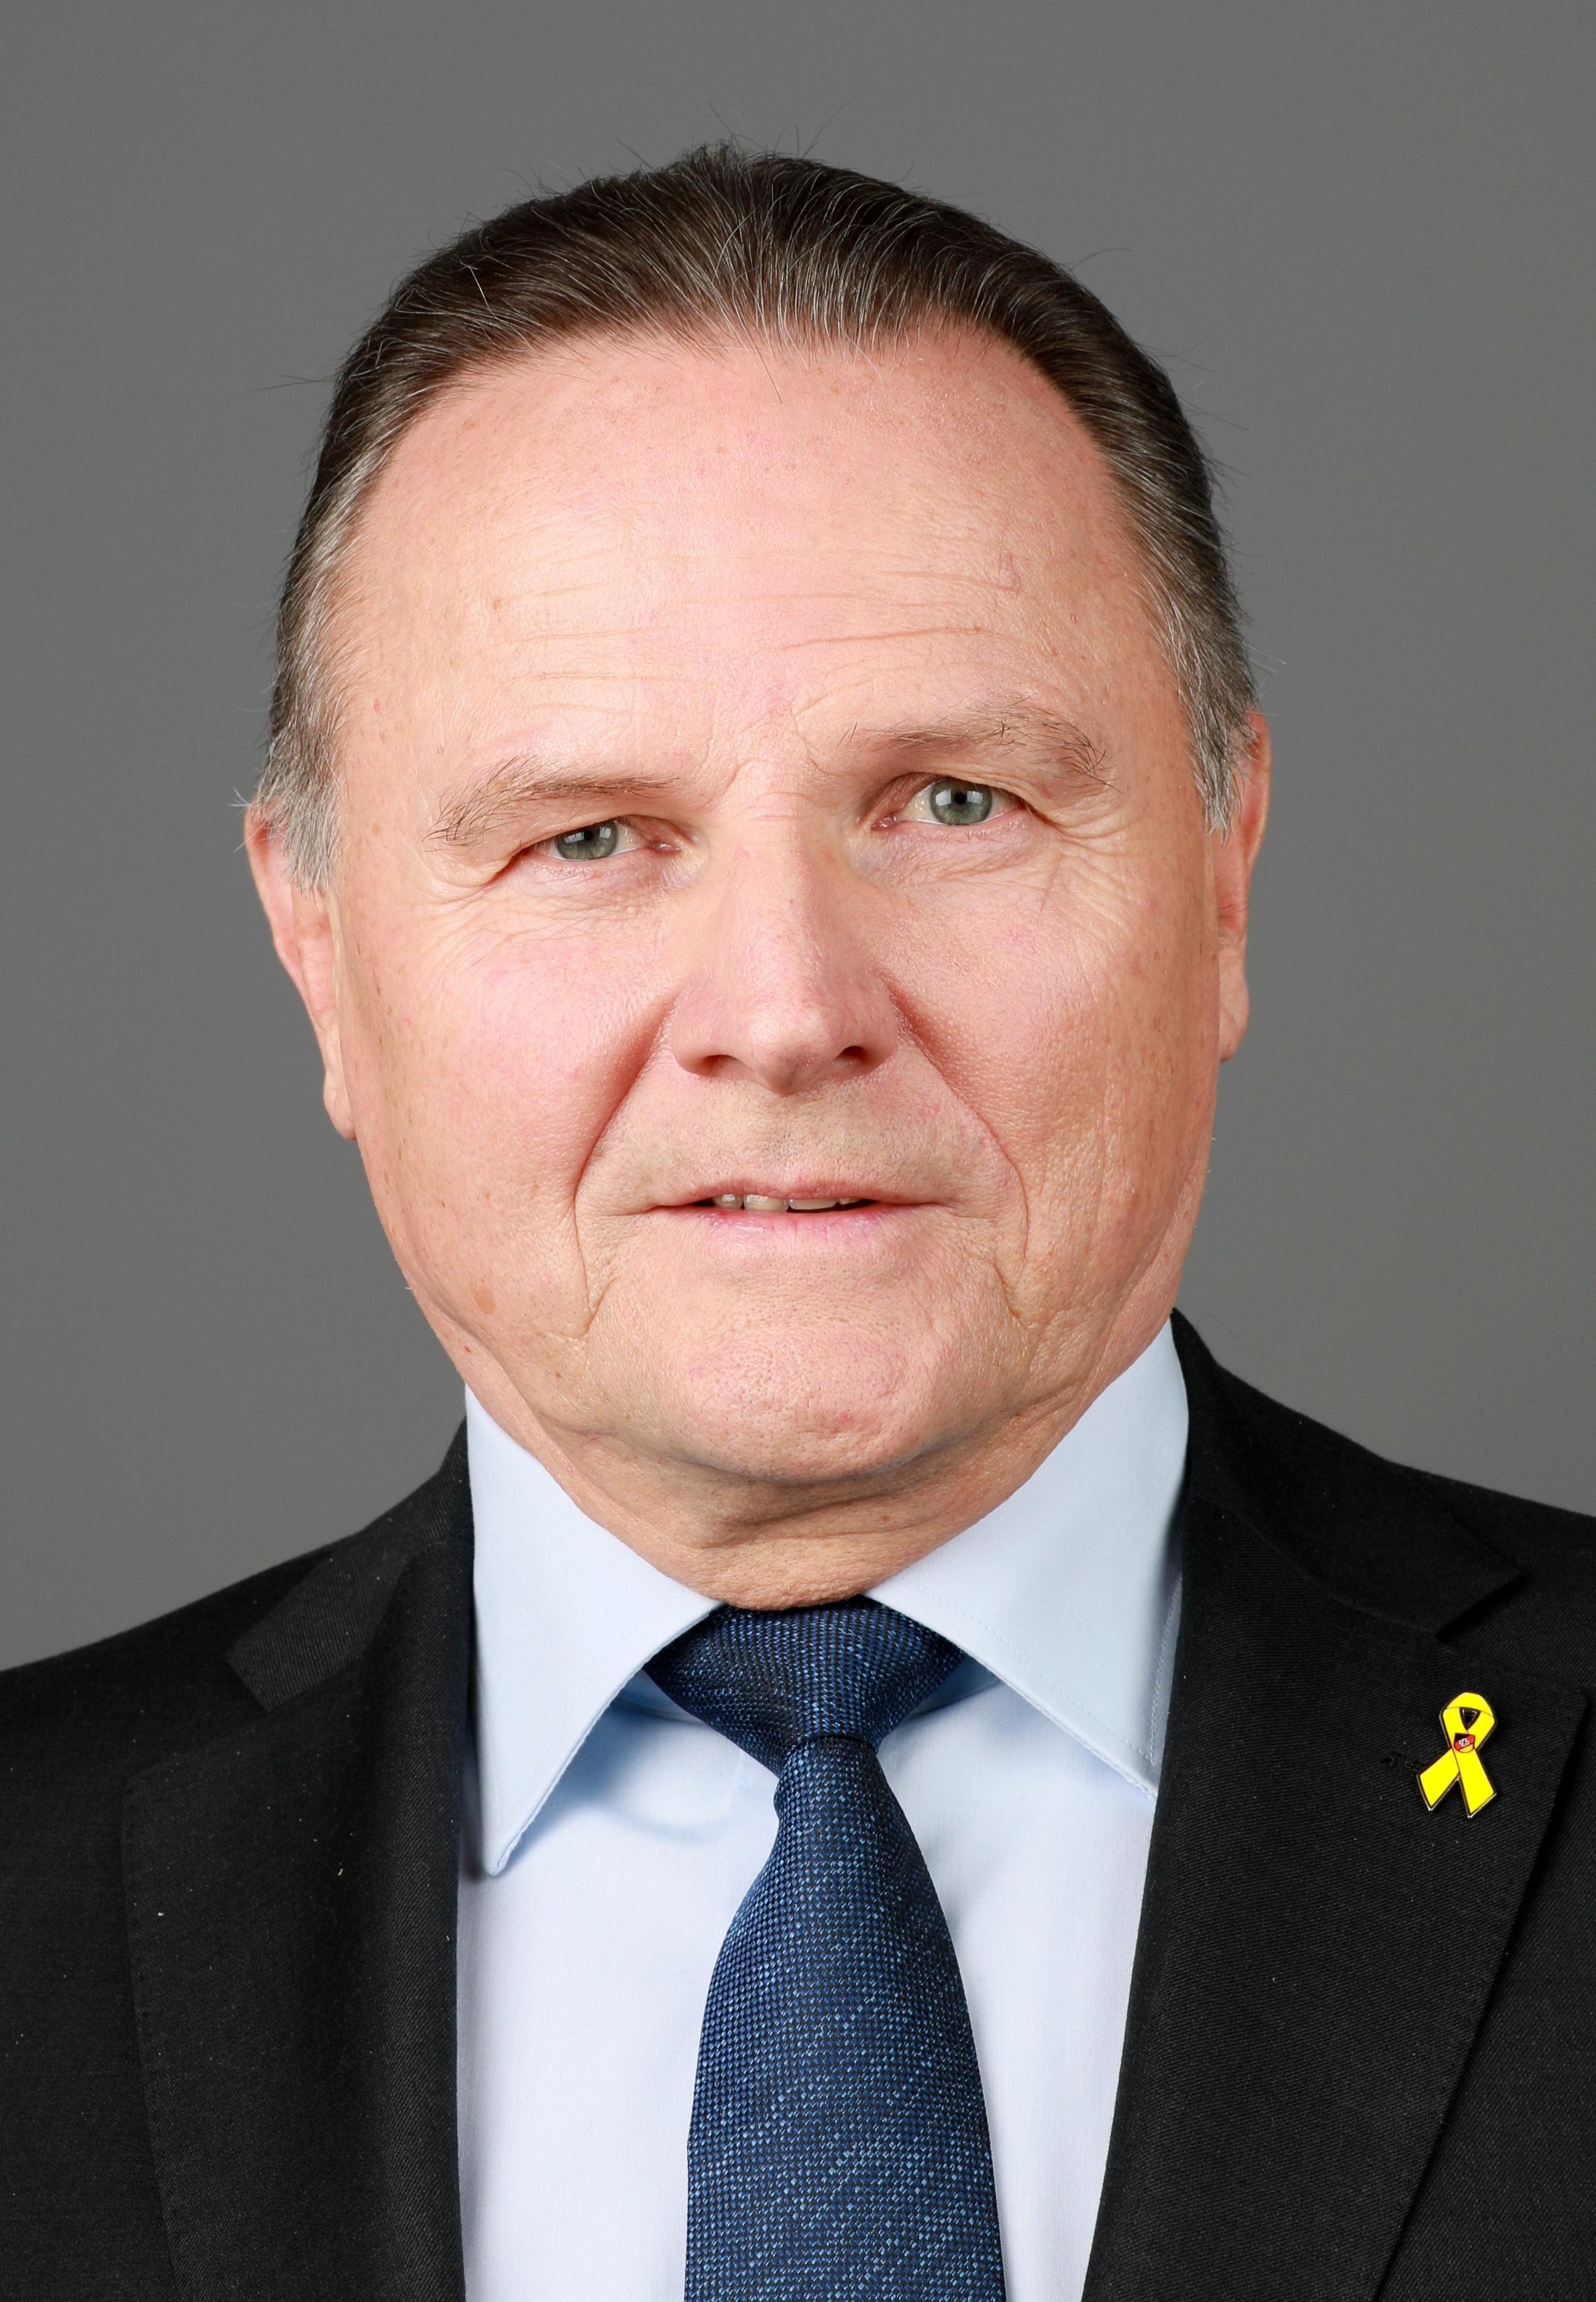 Georg Pazderski – Wikipedia